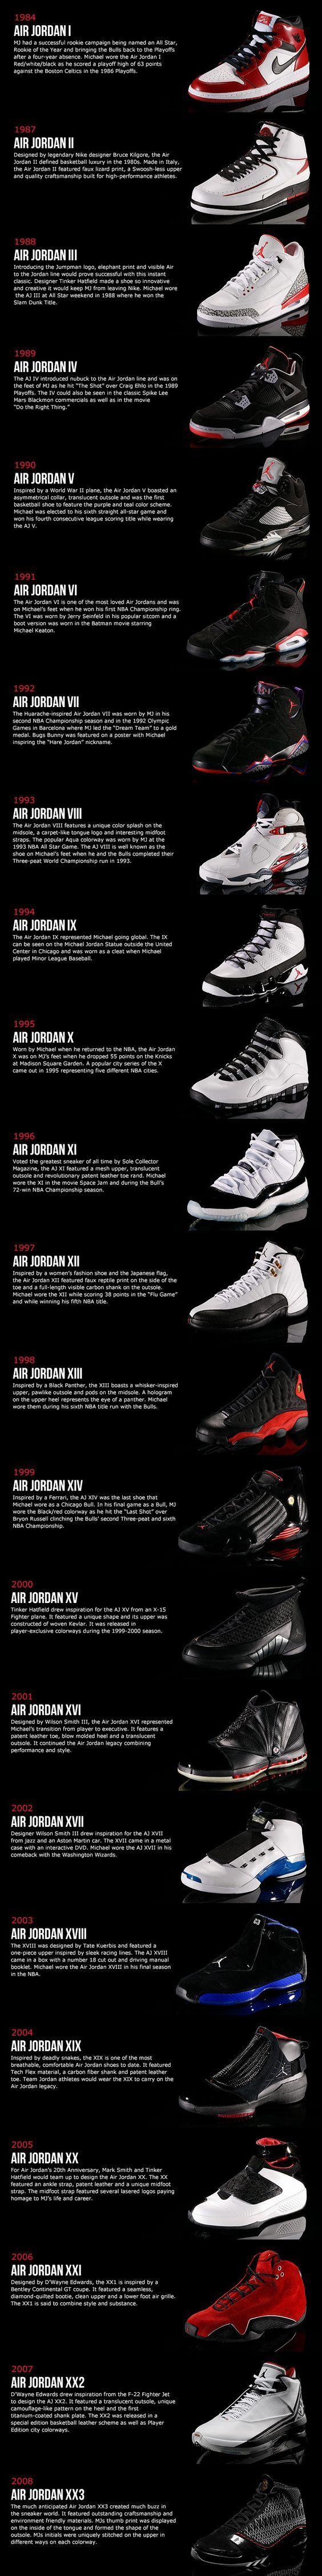 History Of Air Jordan Shoes Air Jordan Is A Brand Of Basketball Footwear And Athletic Clothing Produced B Air Jordan Shoes Shoes Sneakers Jordans Jordan Shoes